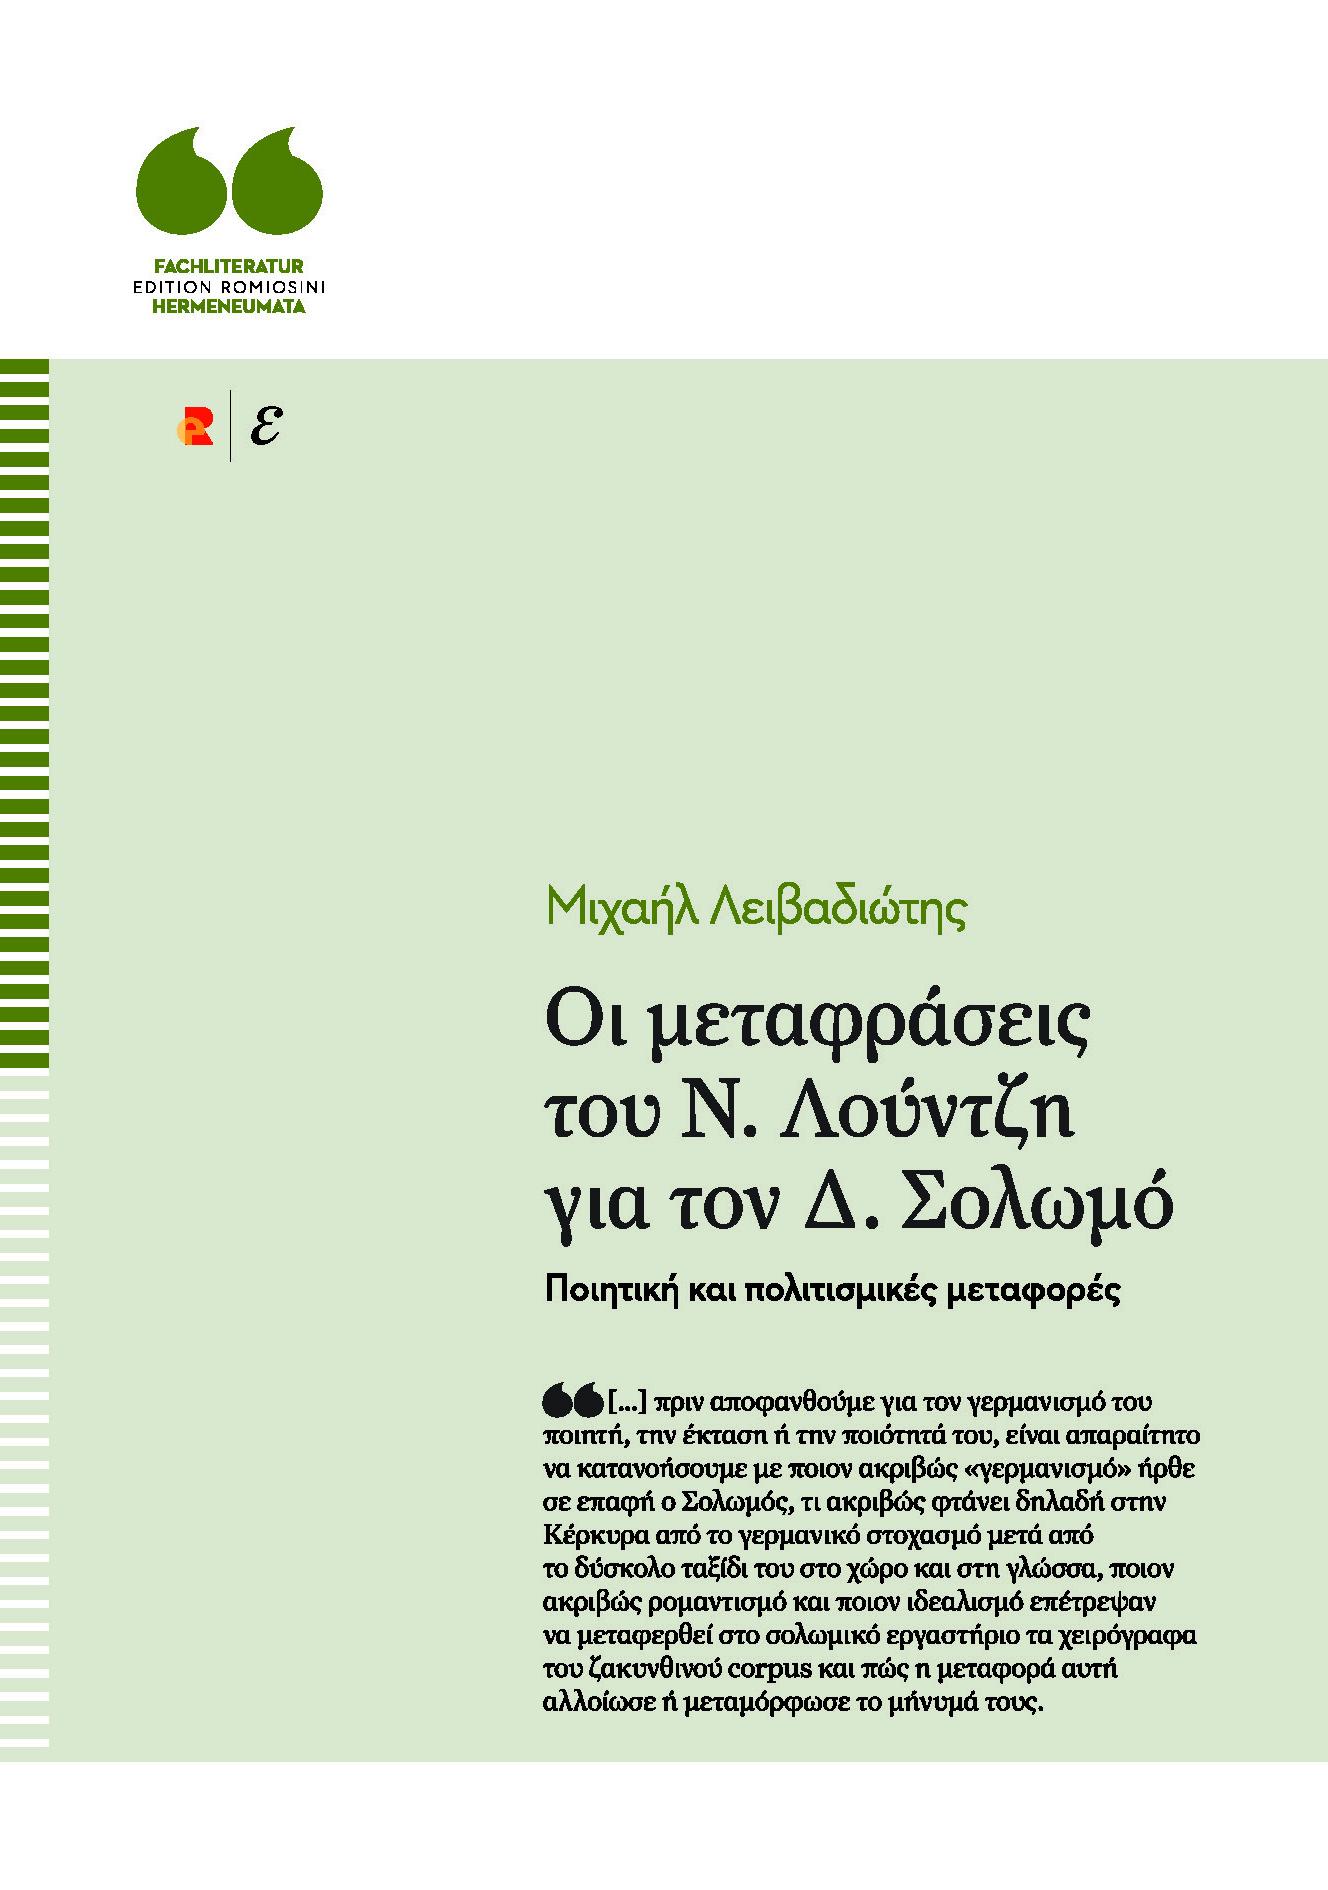 Titelbild für Οι μεταφράσεις του Ν. Λούντζη για τον Δ. Σολωμό: Ποιητική και πολιτισμικές μεταφορές